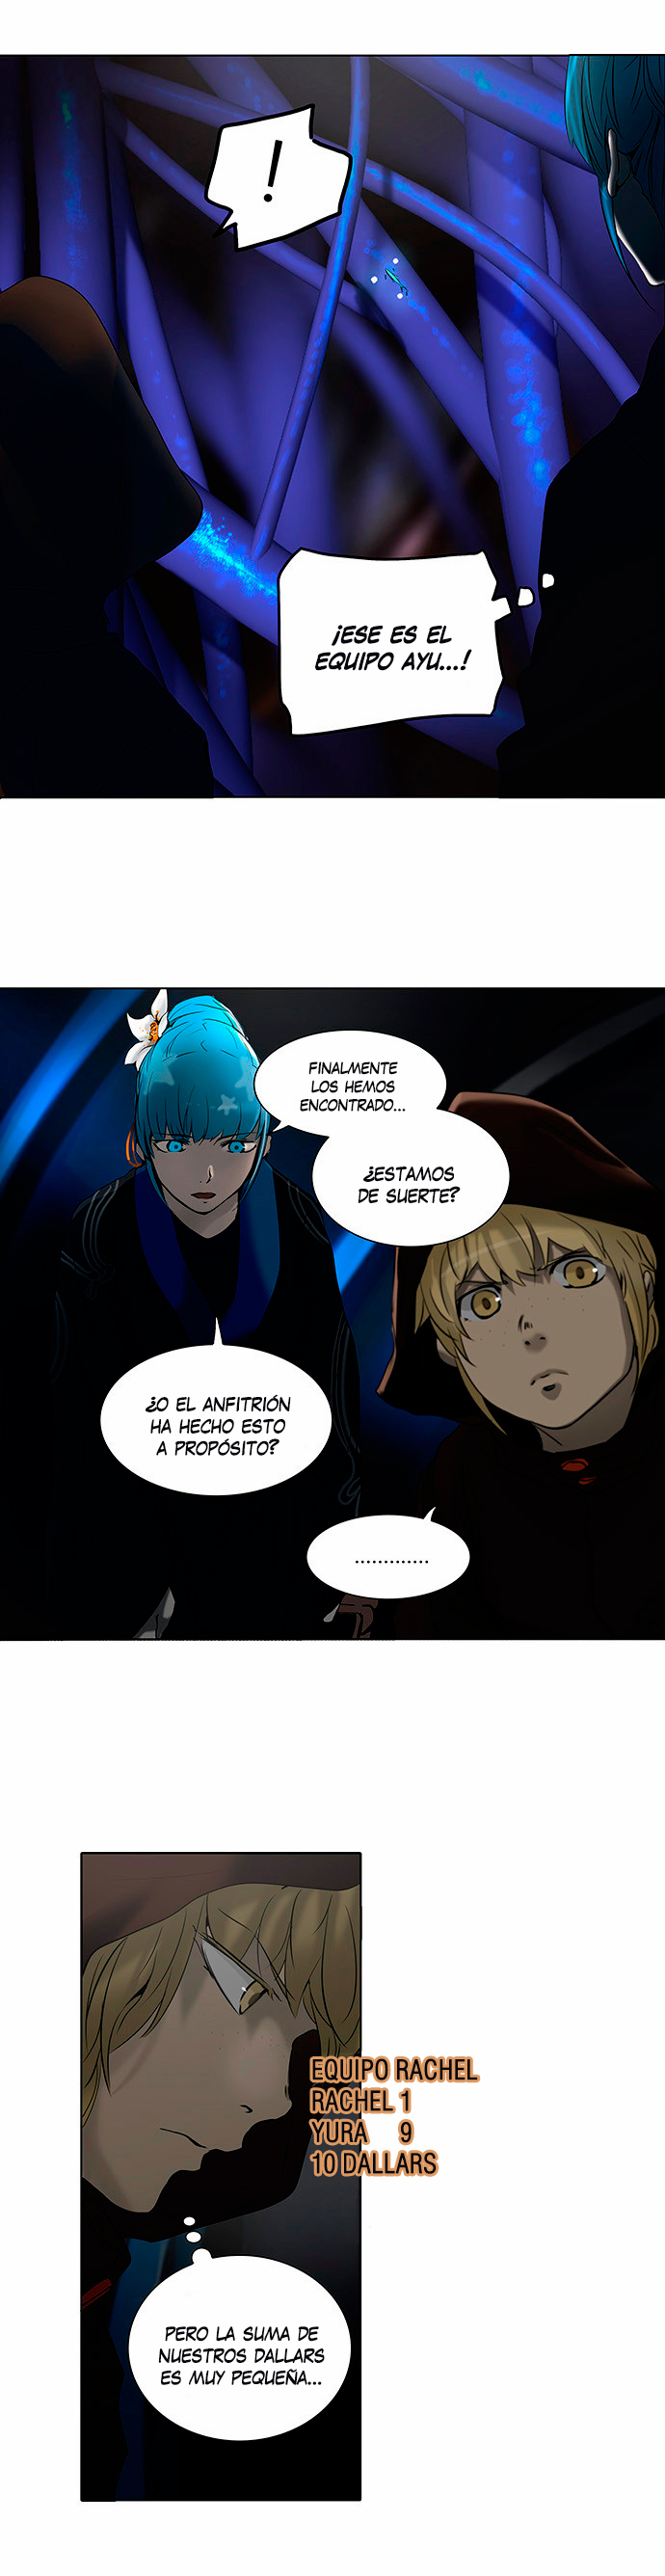 http://c5.ninemanga.com/es_manga/21/149/433186/434f2774582010201d7784fa906e546a.jpg Page 8